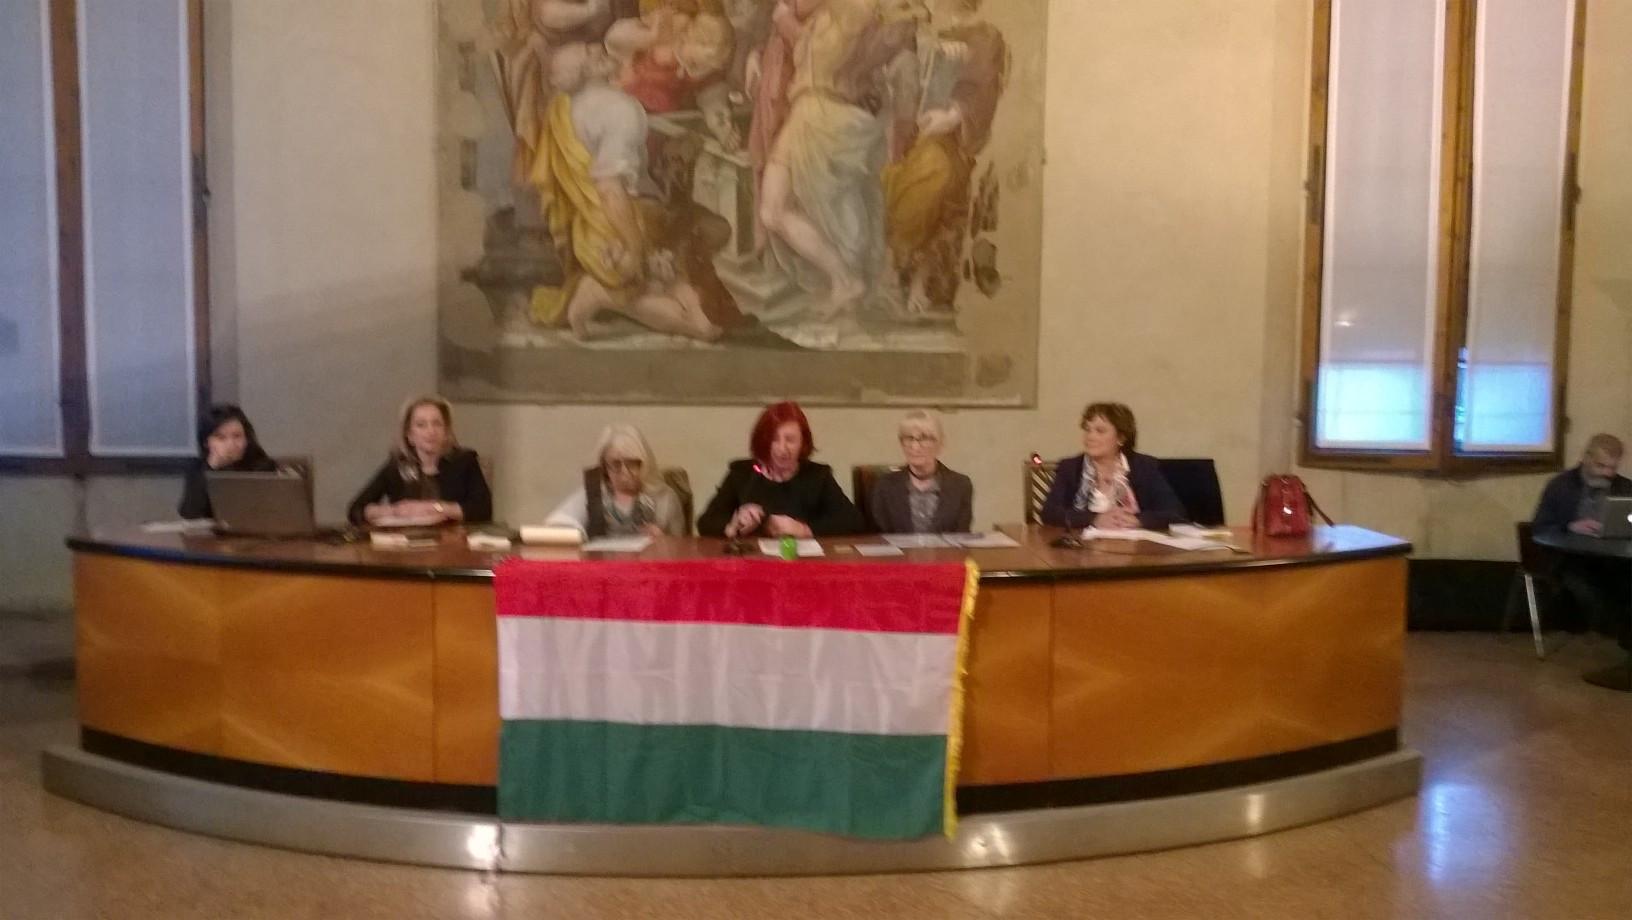 dr. Miliczky Erzsébet, Liliana, Martissa Mengoli, Biancastella Antonino